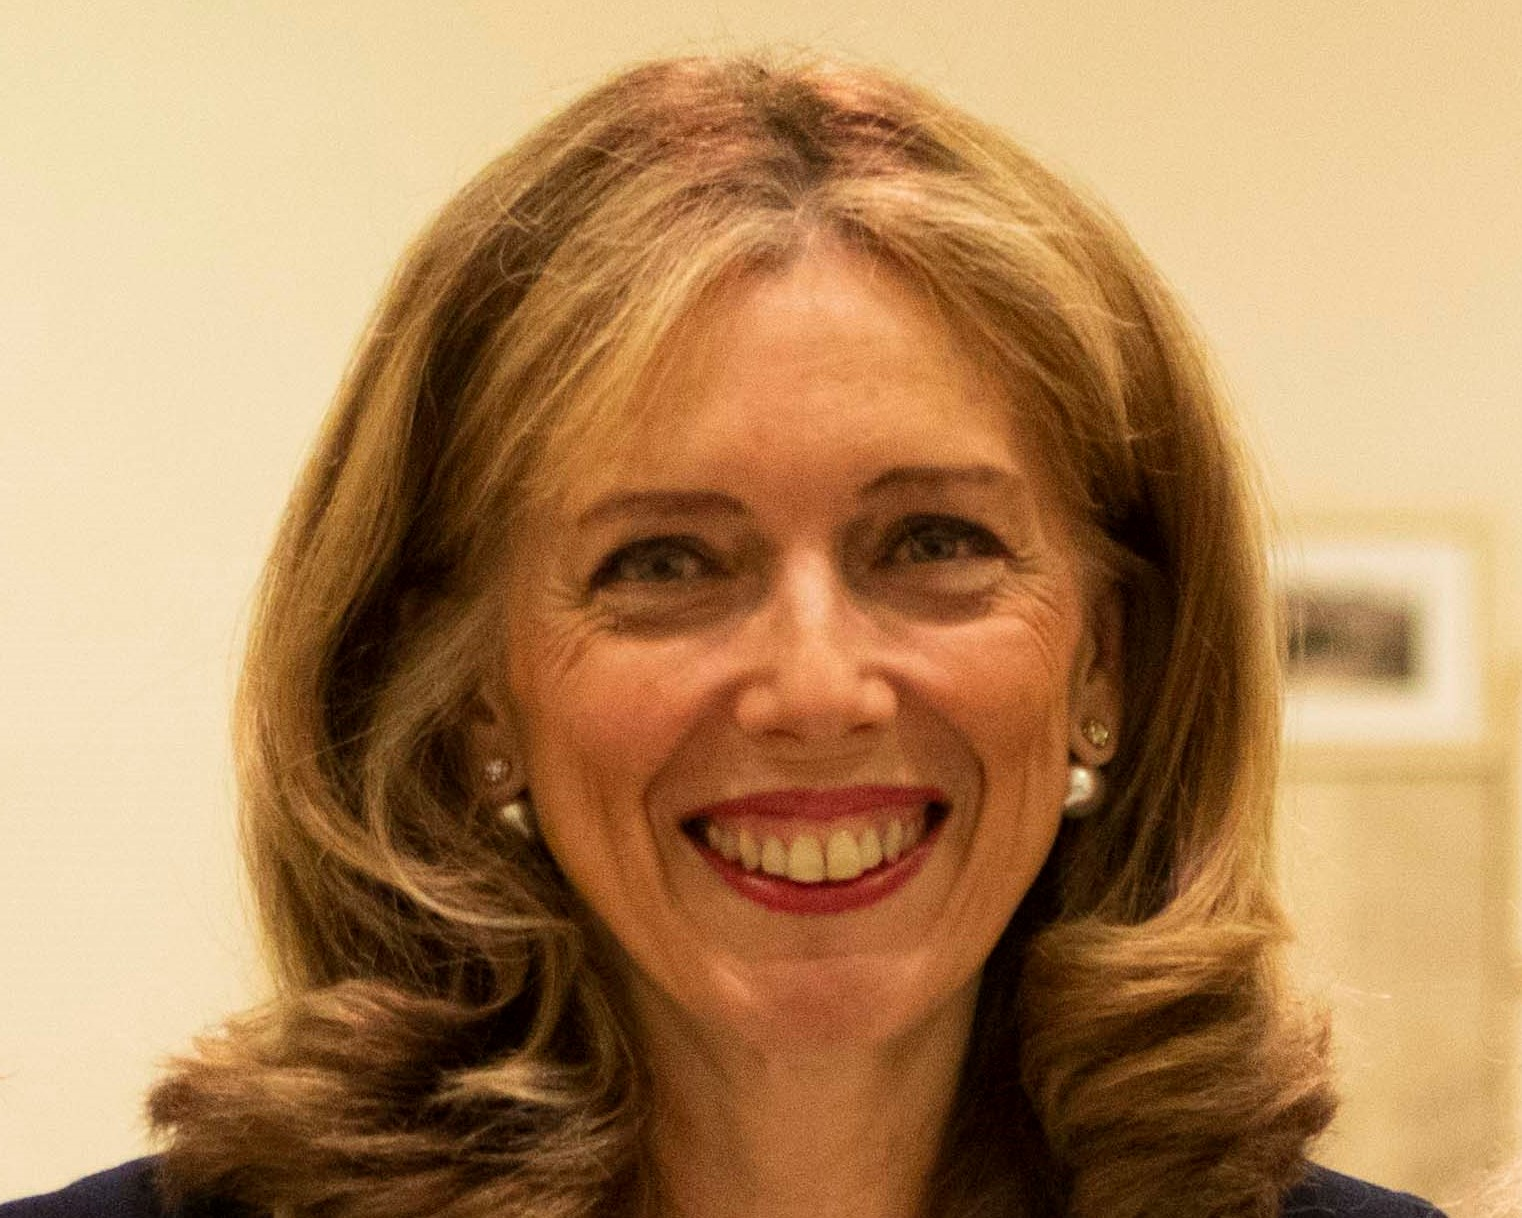 PAOLA SCHWIZER - Supervision, Risks & Profitability